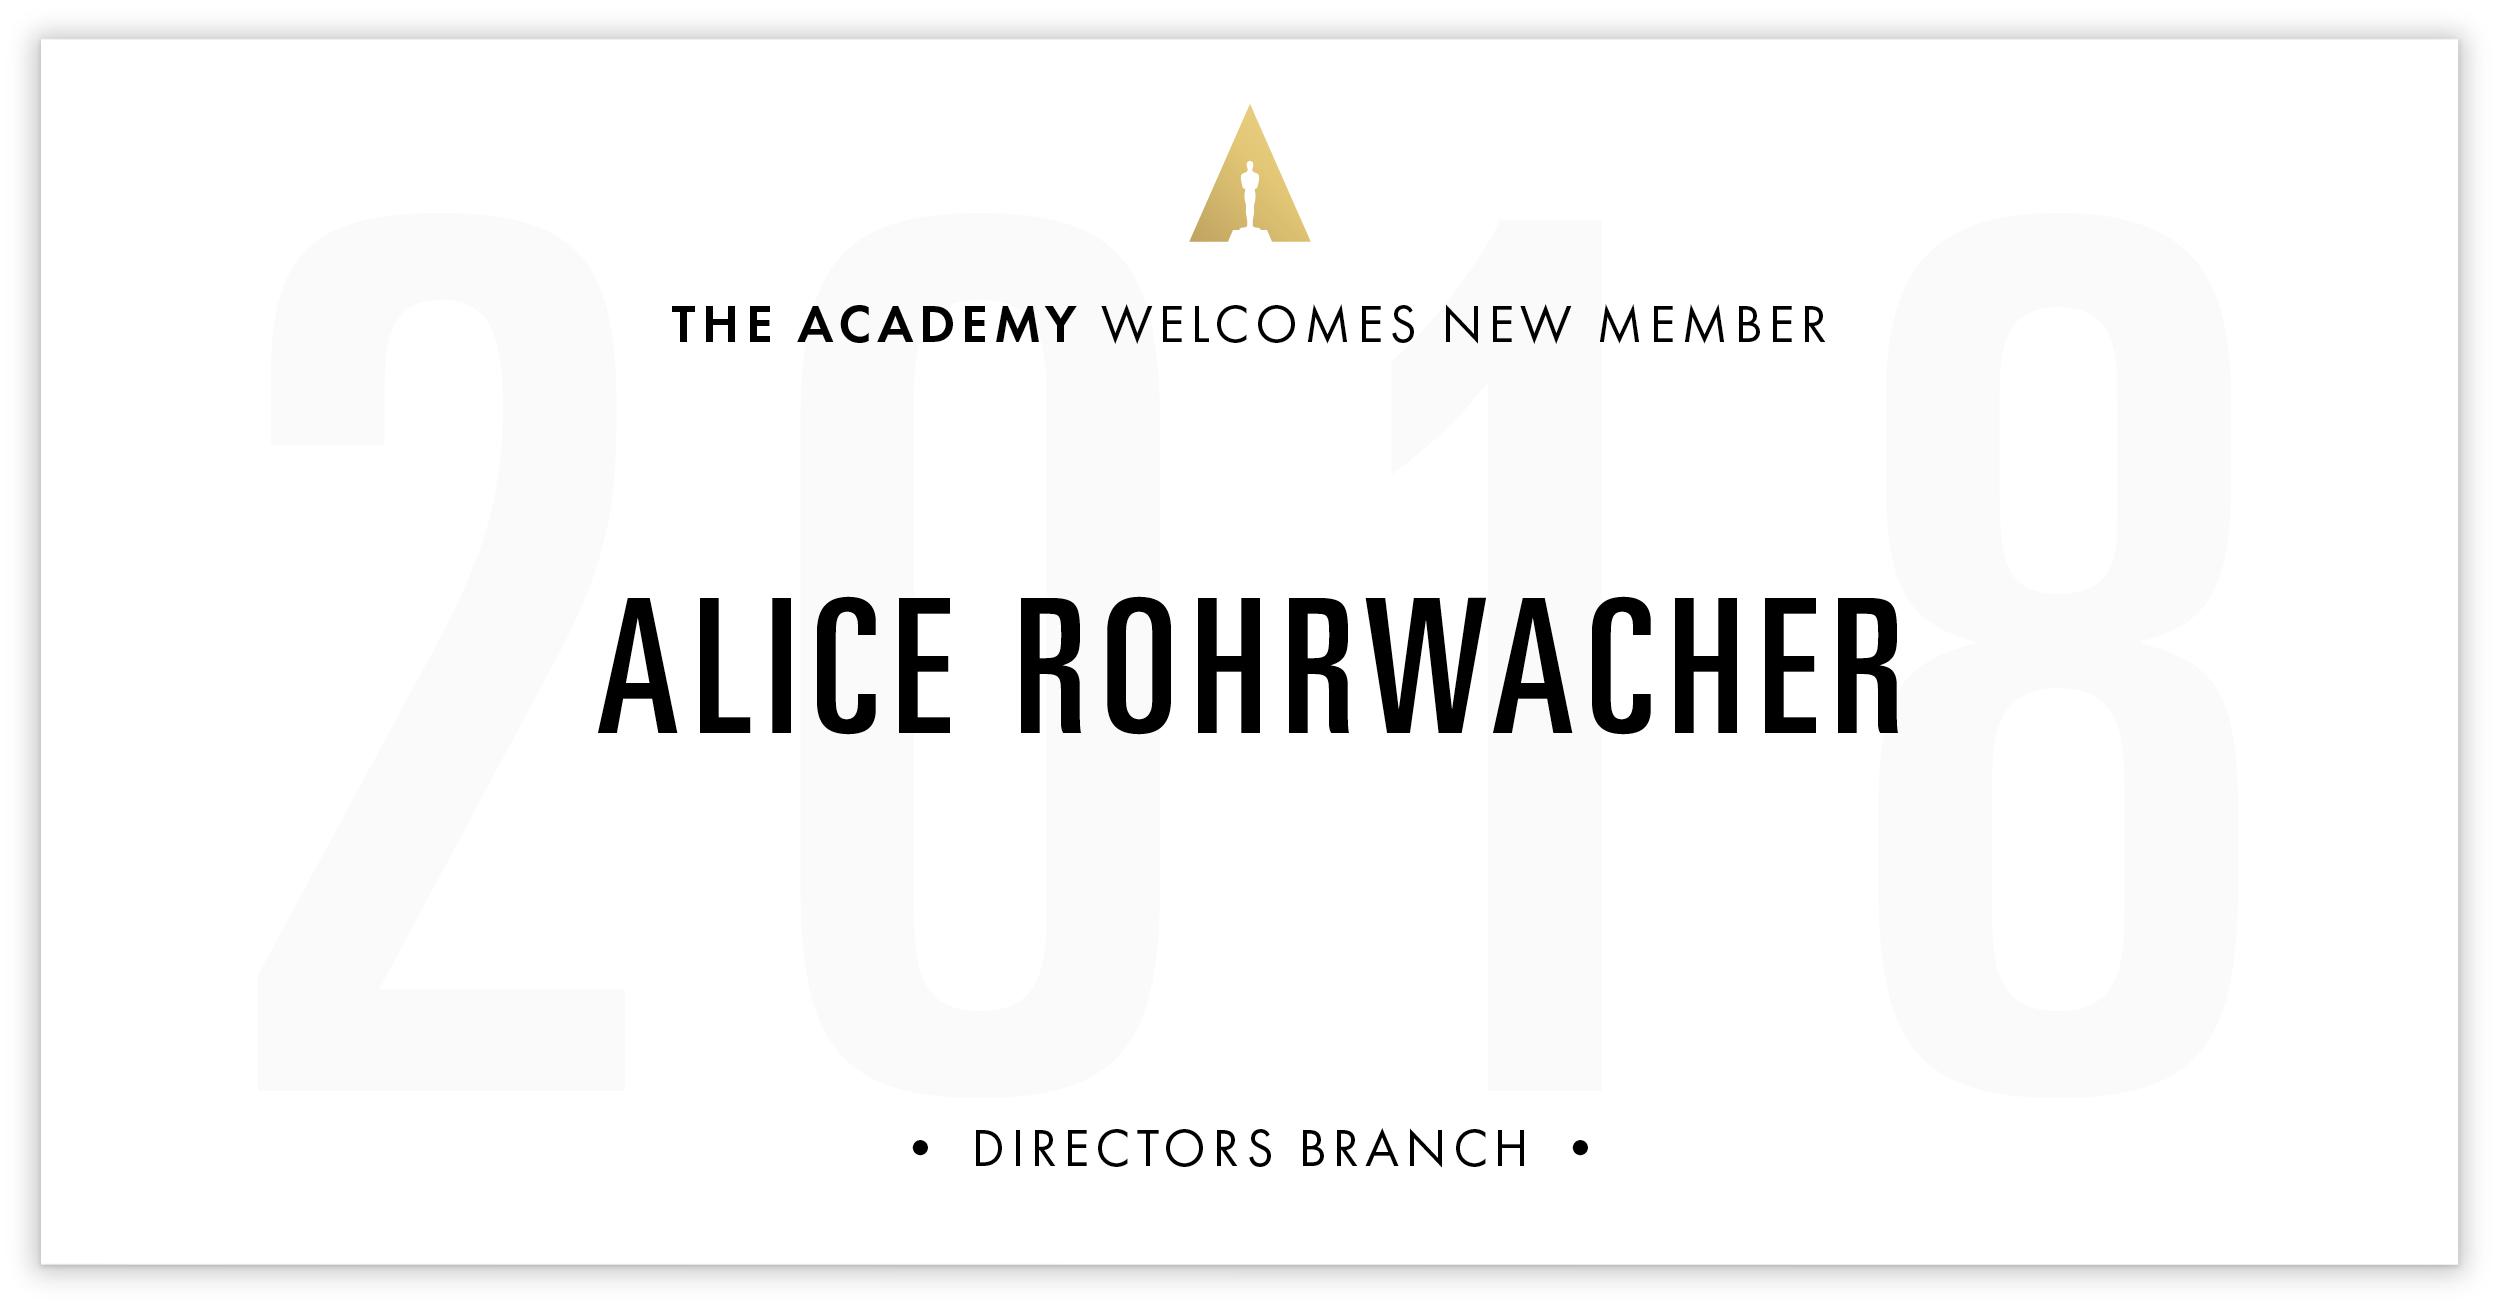 Alice Rohrwacher is invited!